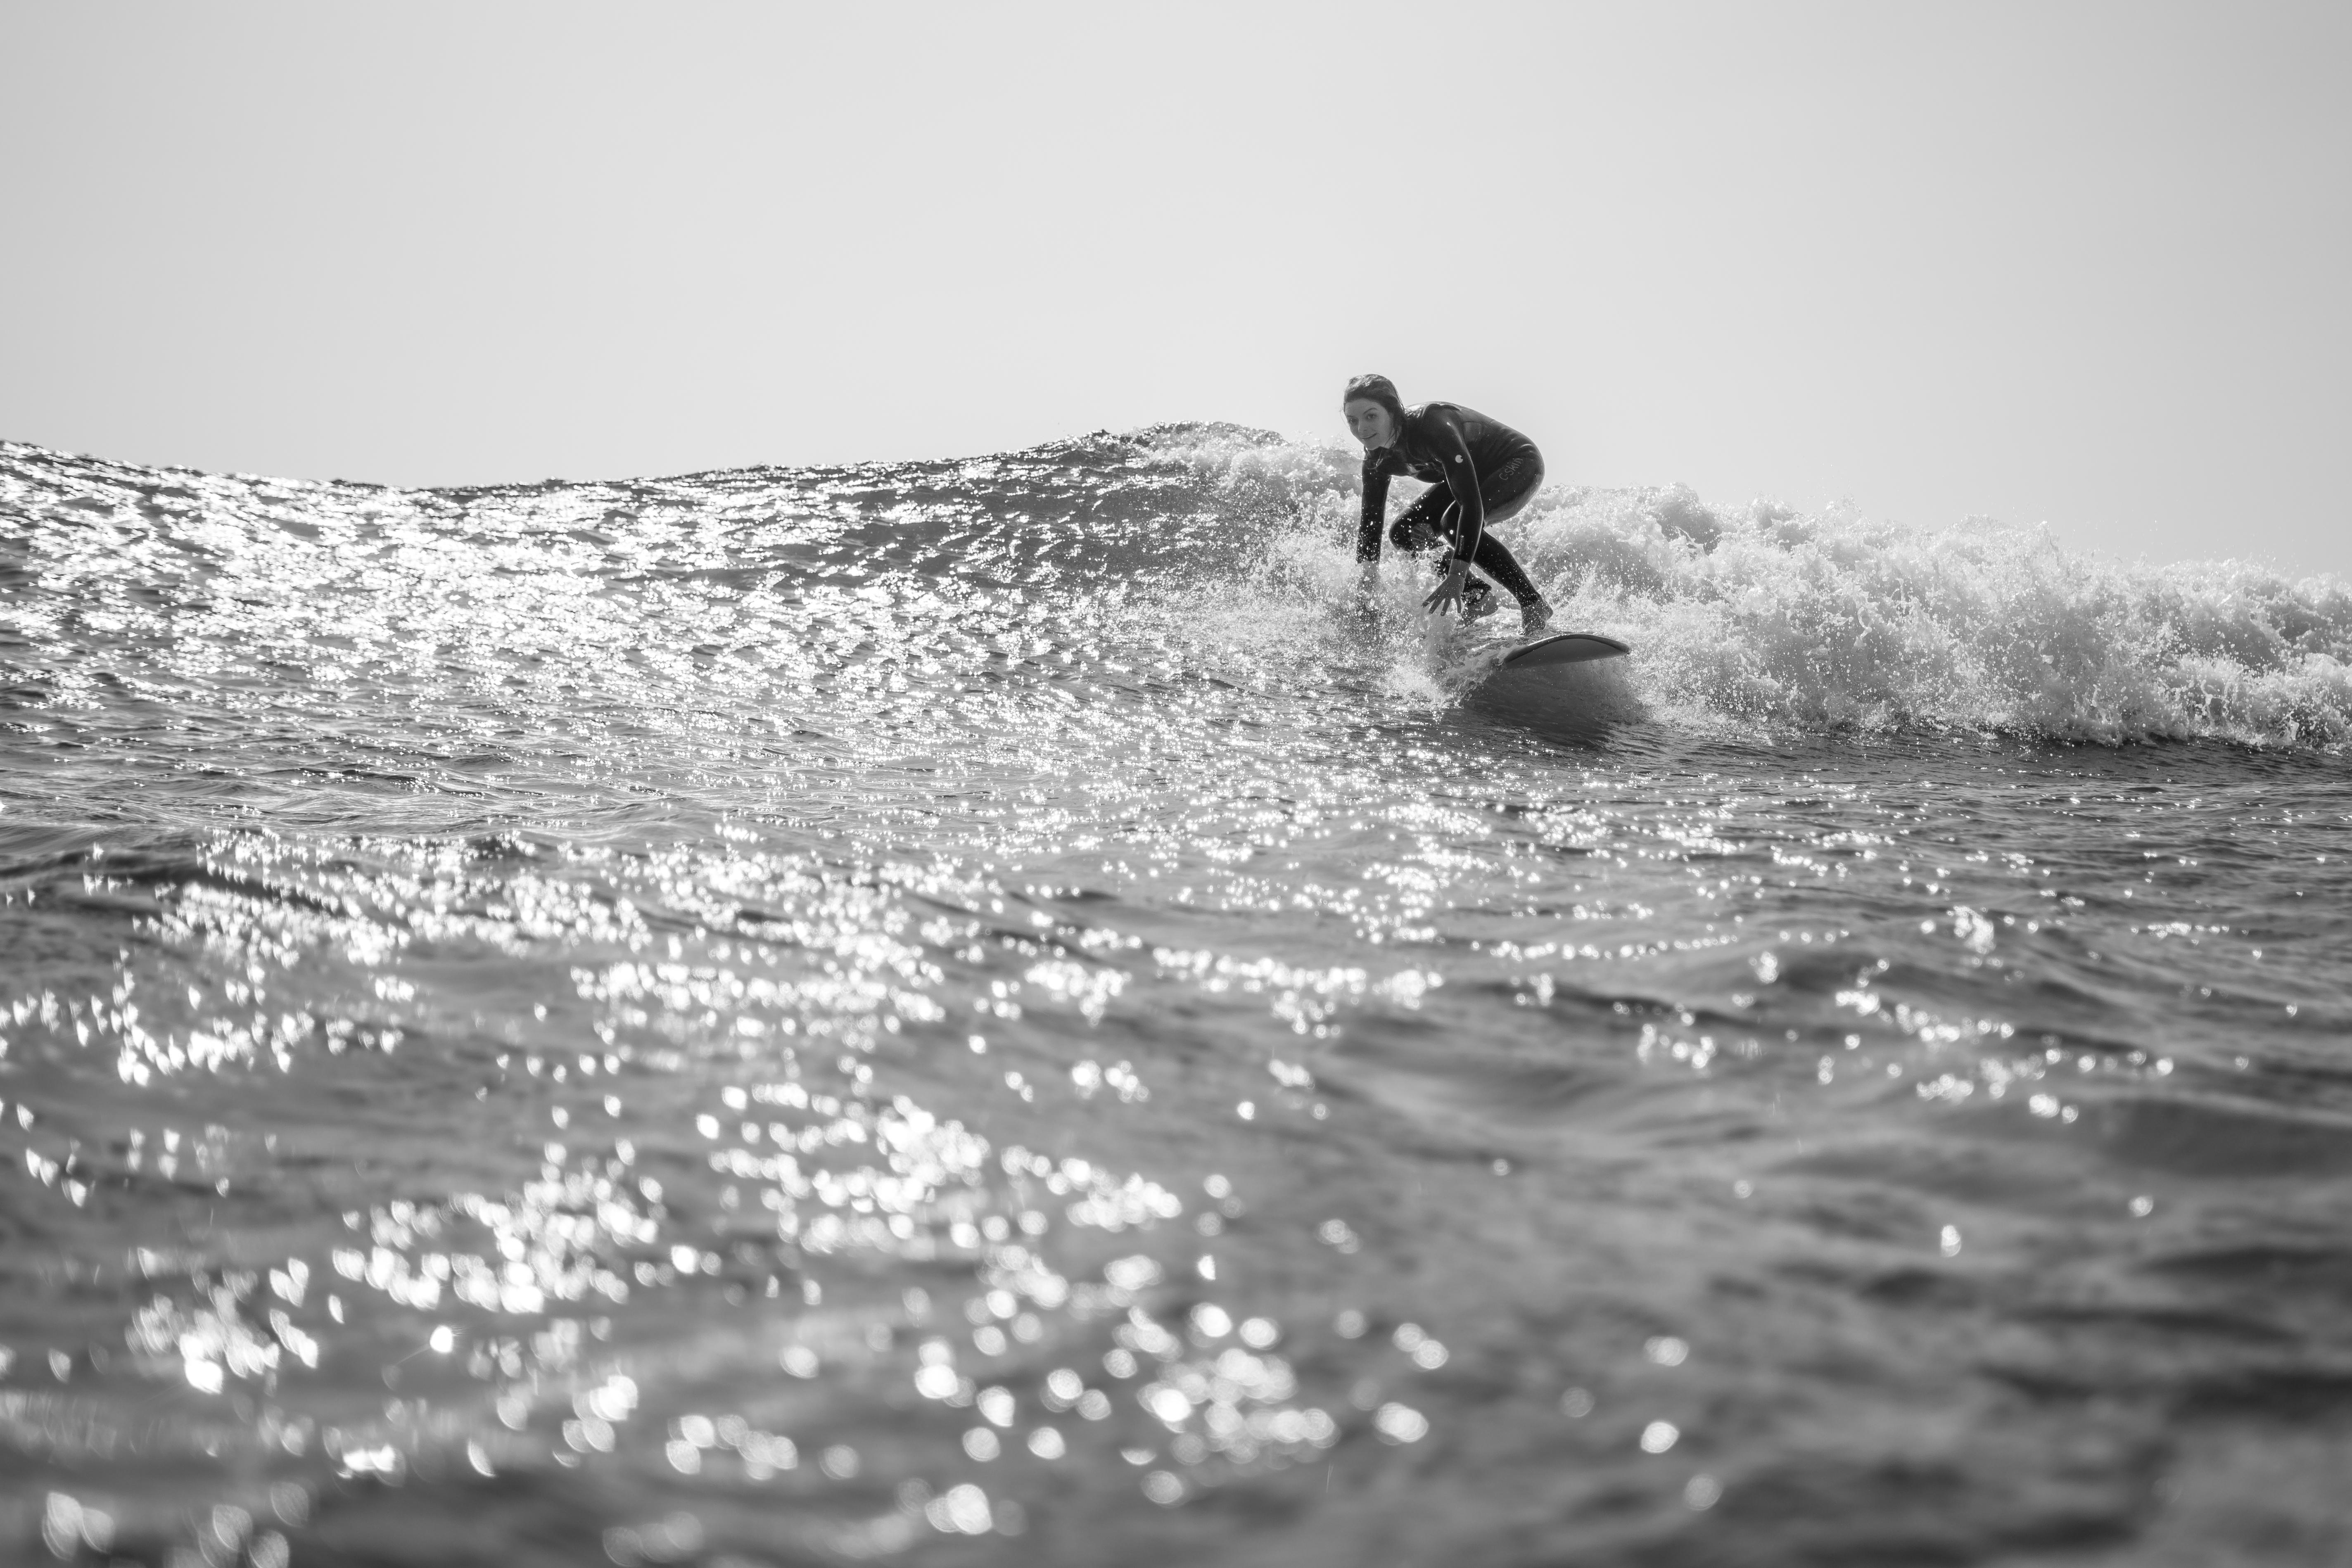 surf yoga portugal retreat saltwater yoga ROXY longboard waves soul healthy